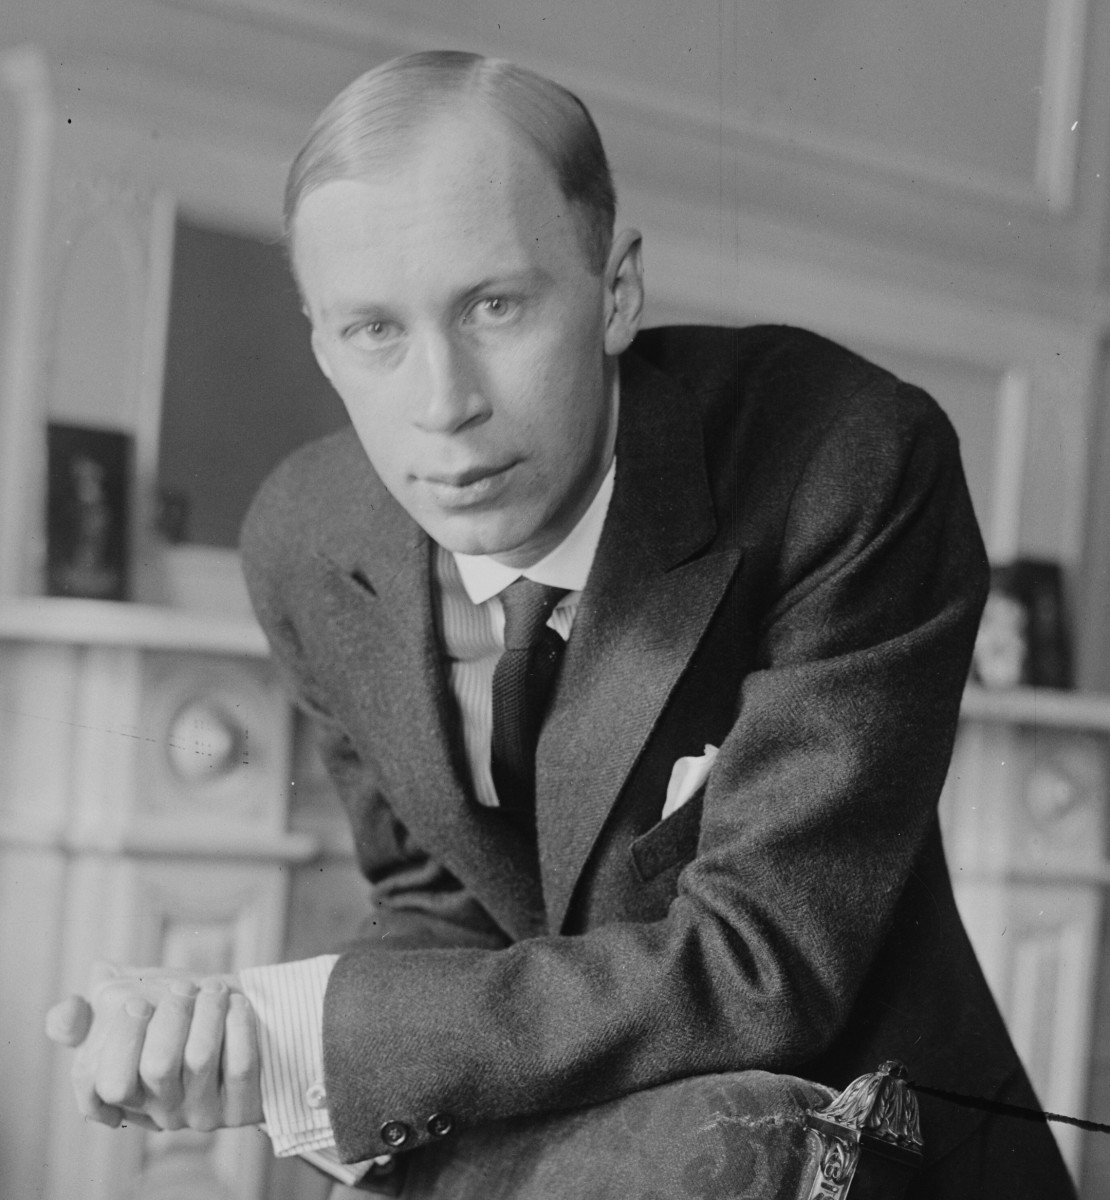 Photograph of Prokoviev c1918.